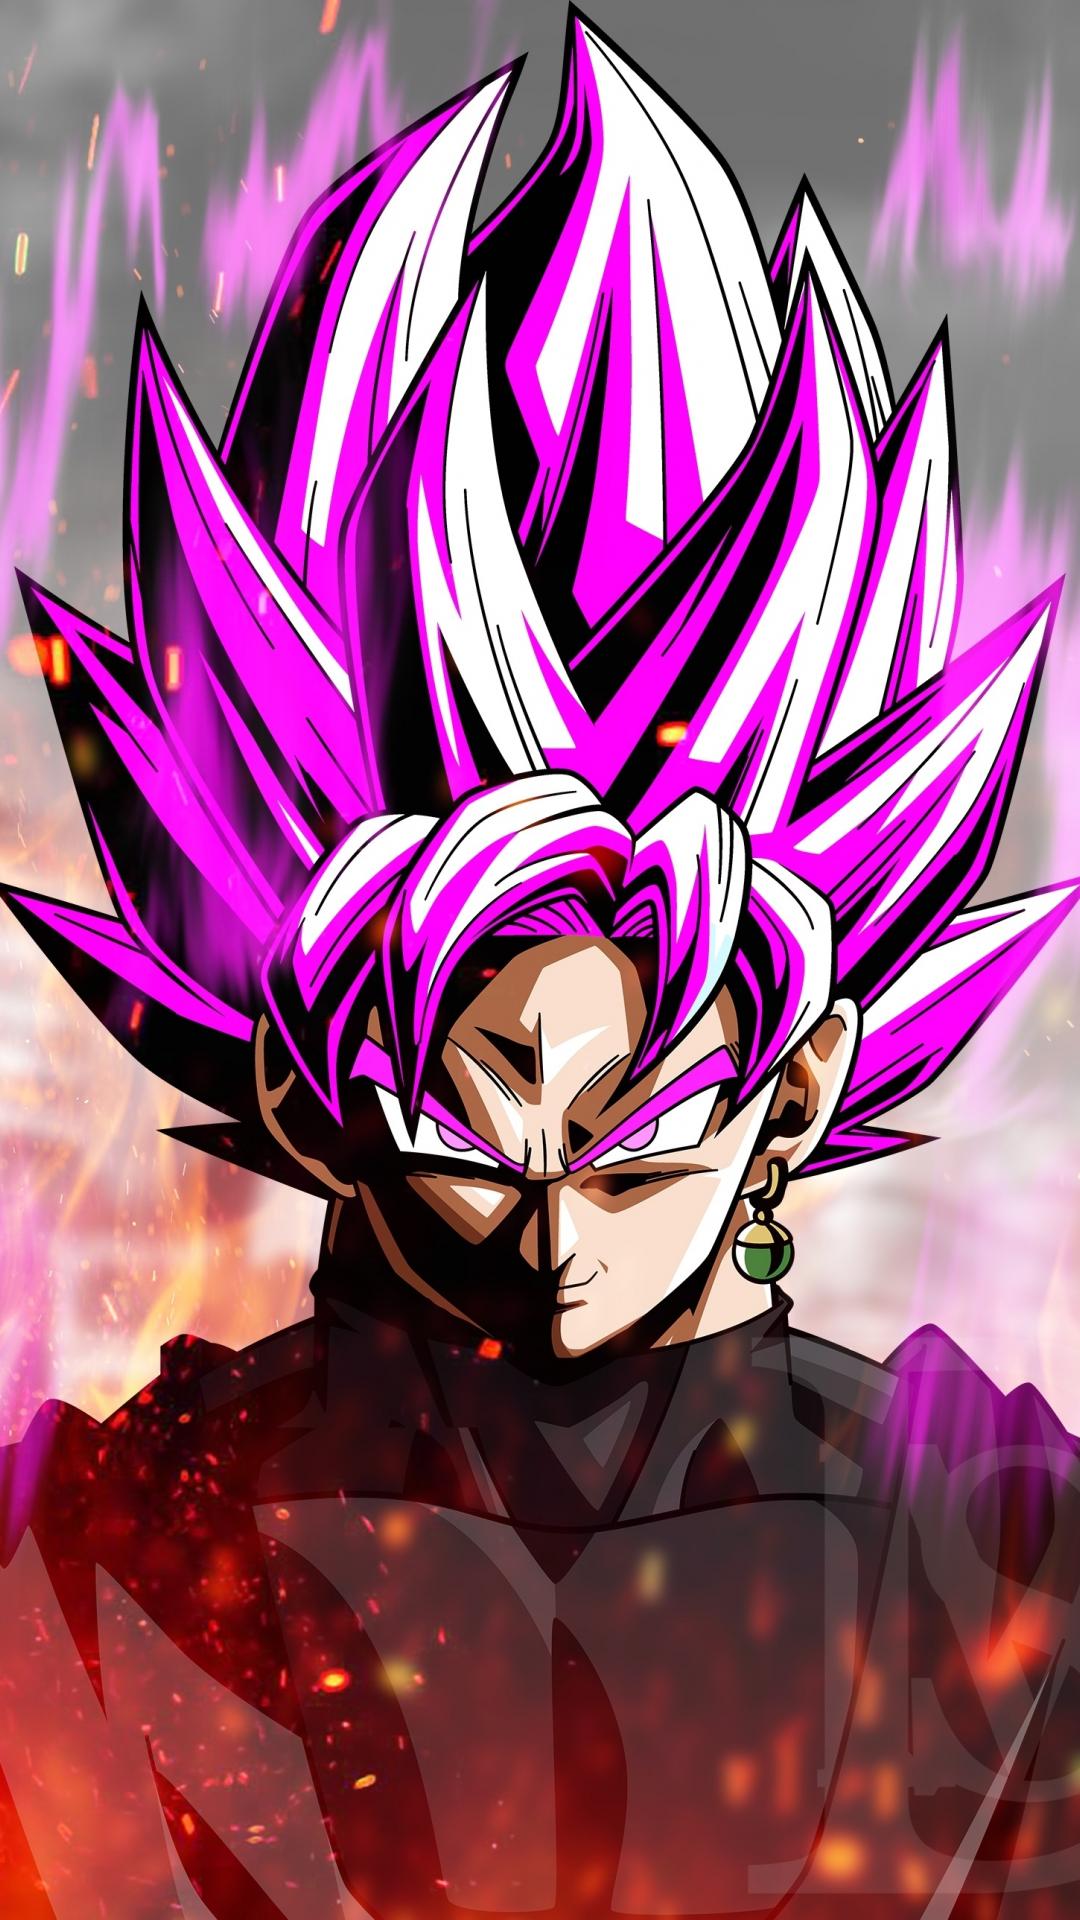 Download 1080x1920 Wallpaper Anime Black Violet Hair Dragon